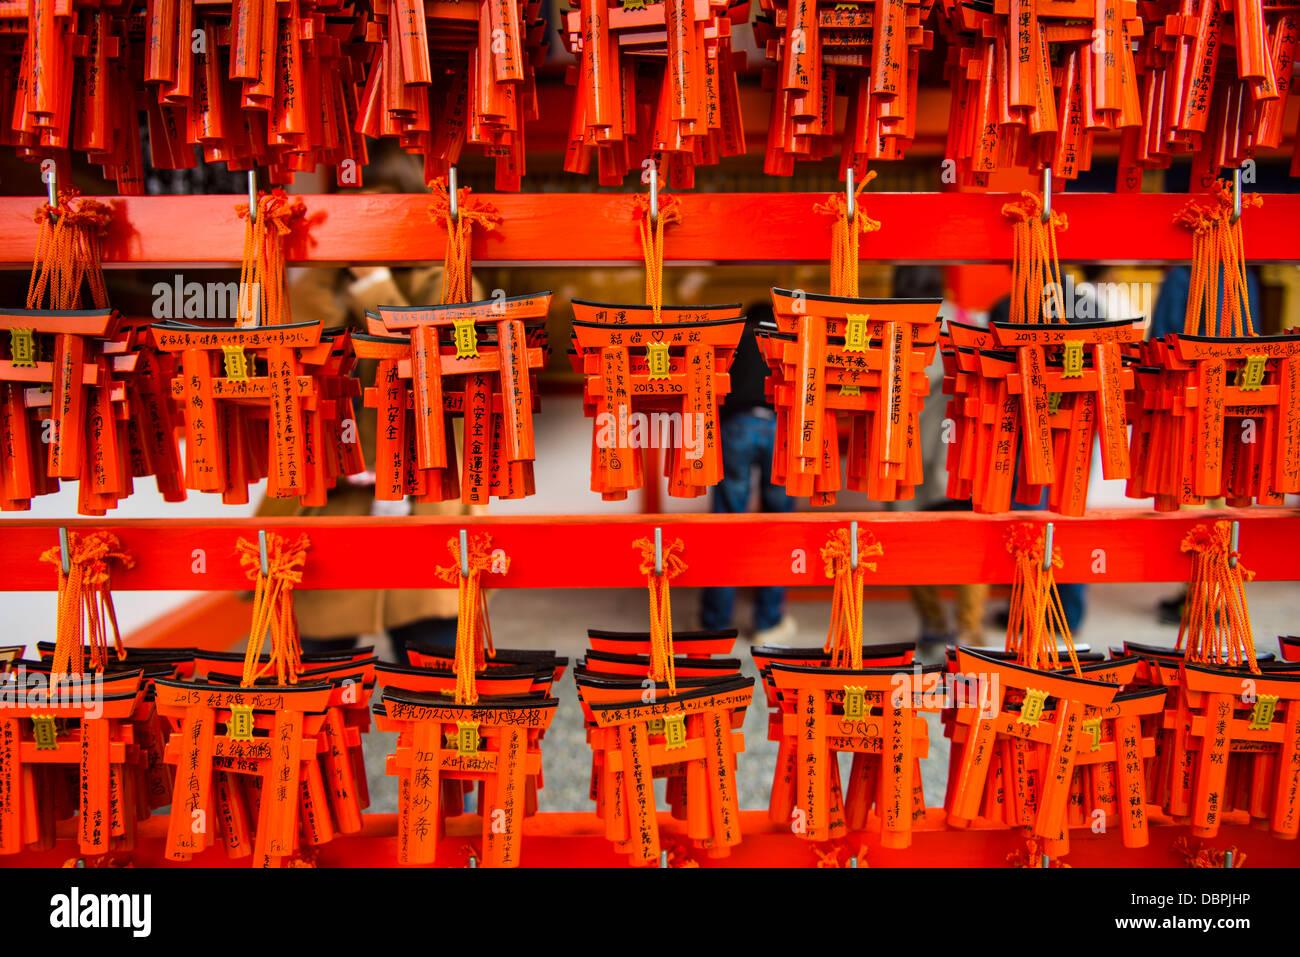 Souvenirs of the Endless Red Gates of Kyoto's Fushimi Inari Shrine, Kyoto, Japan, Asia - Stock Image